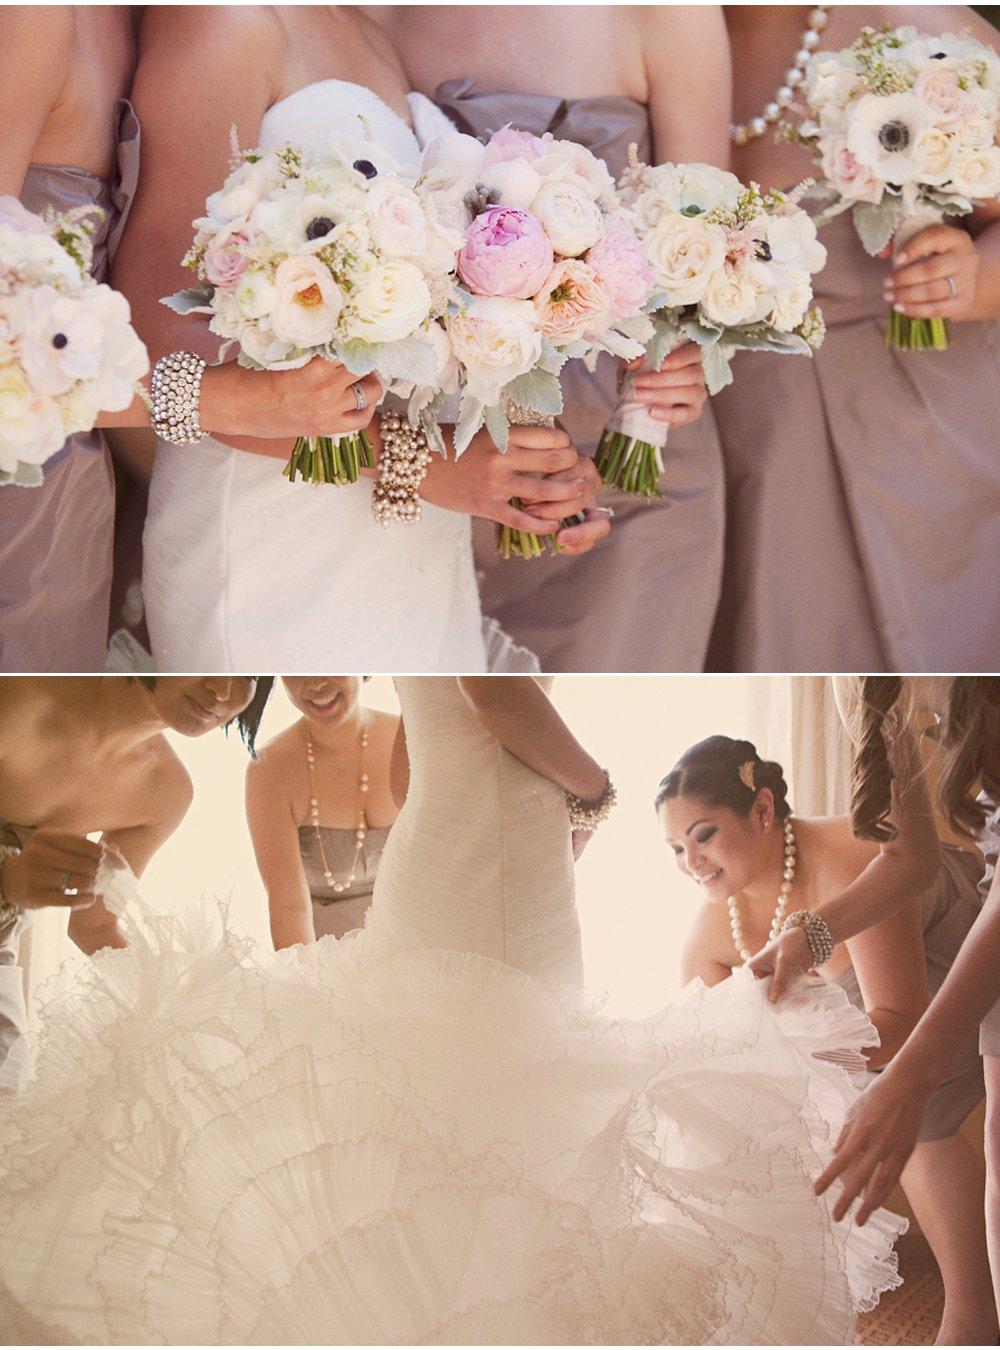 Real-wedding-romantic-wedding-dress-bridal-bouquet.full